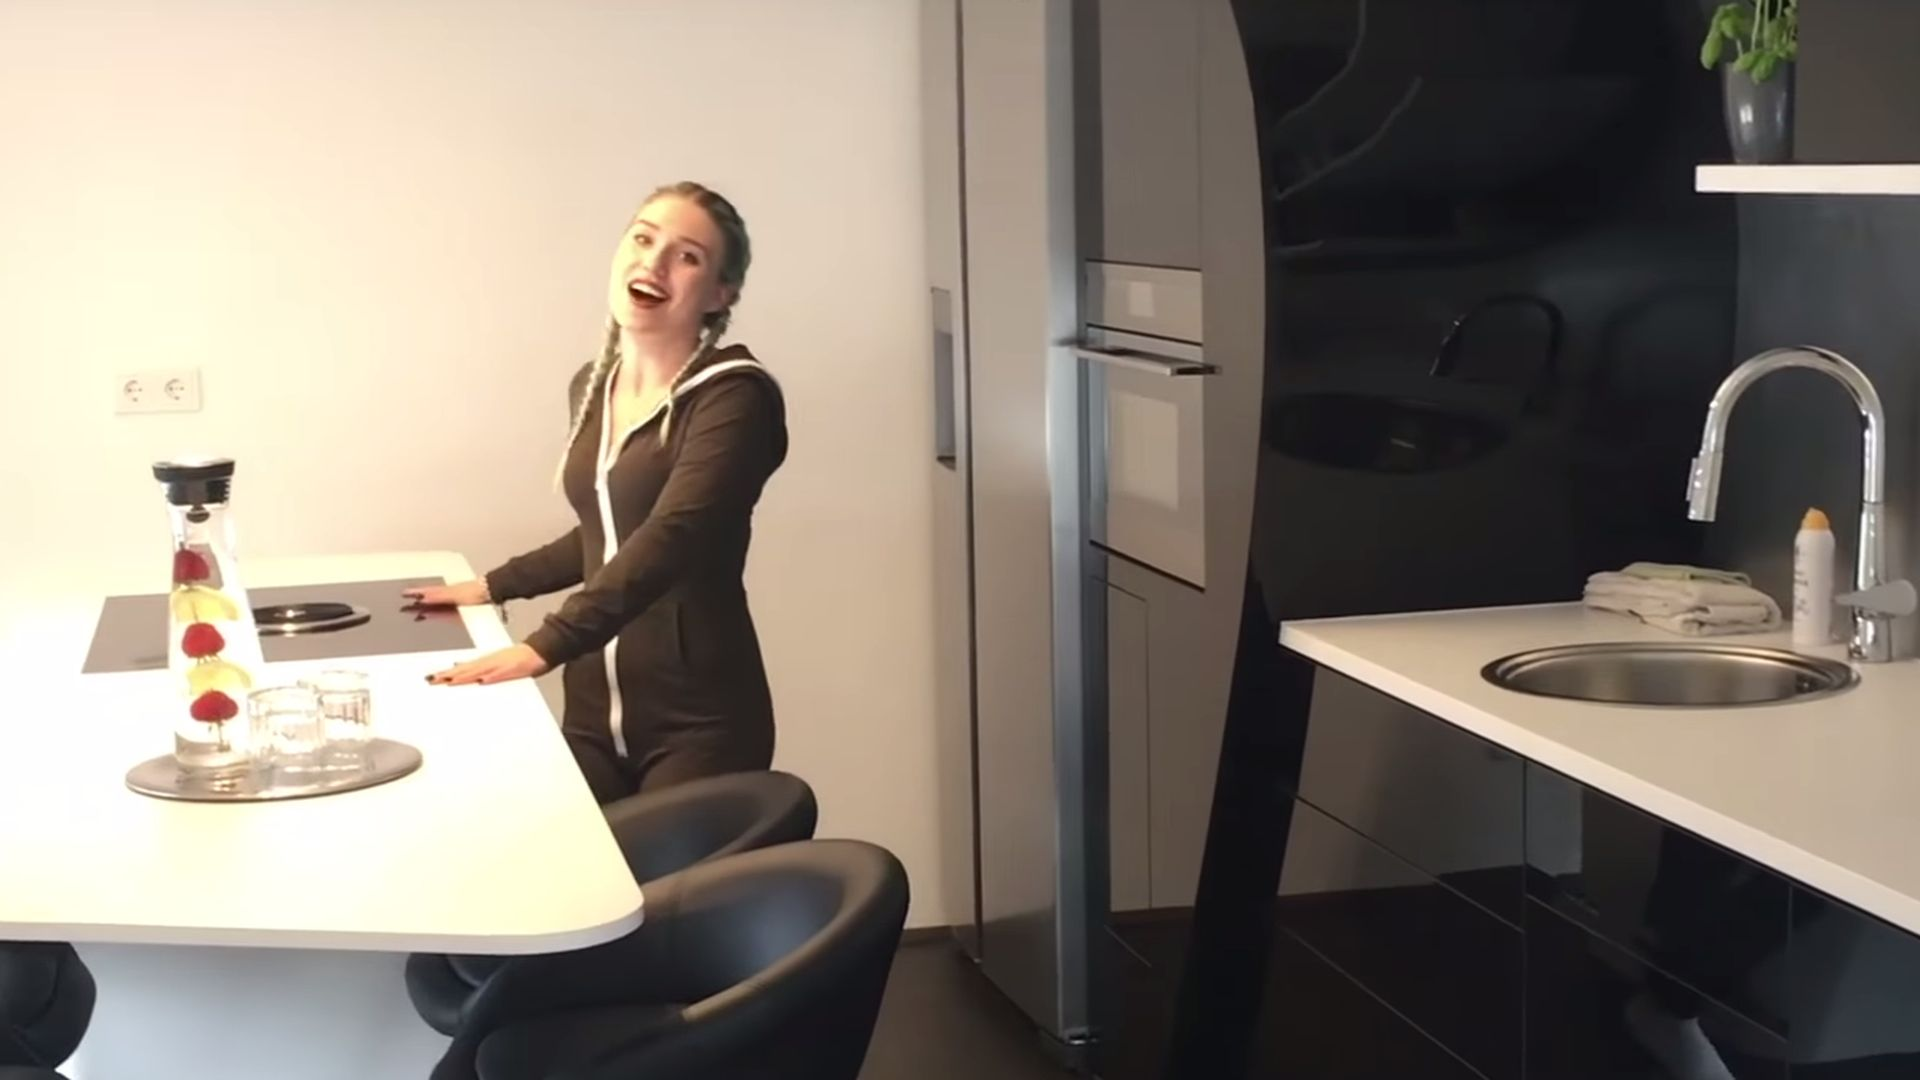 Protzige room tour so luxuri s wohnt youtube bibi - Youtube wohnung ...